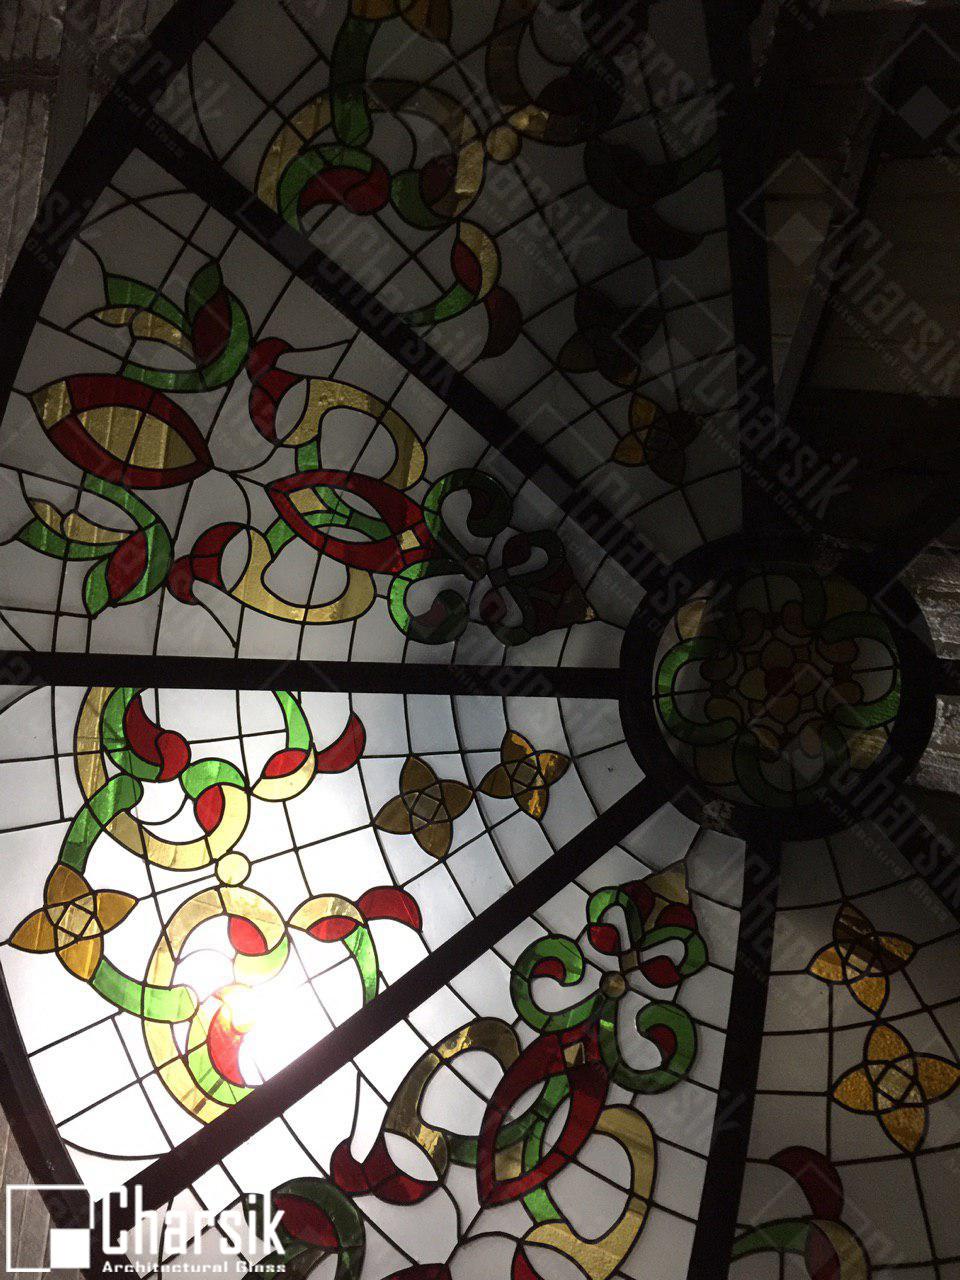 نورگیر سقفی تزئینی چارسیک گنبد شیشه ای استین گلس